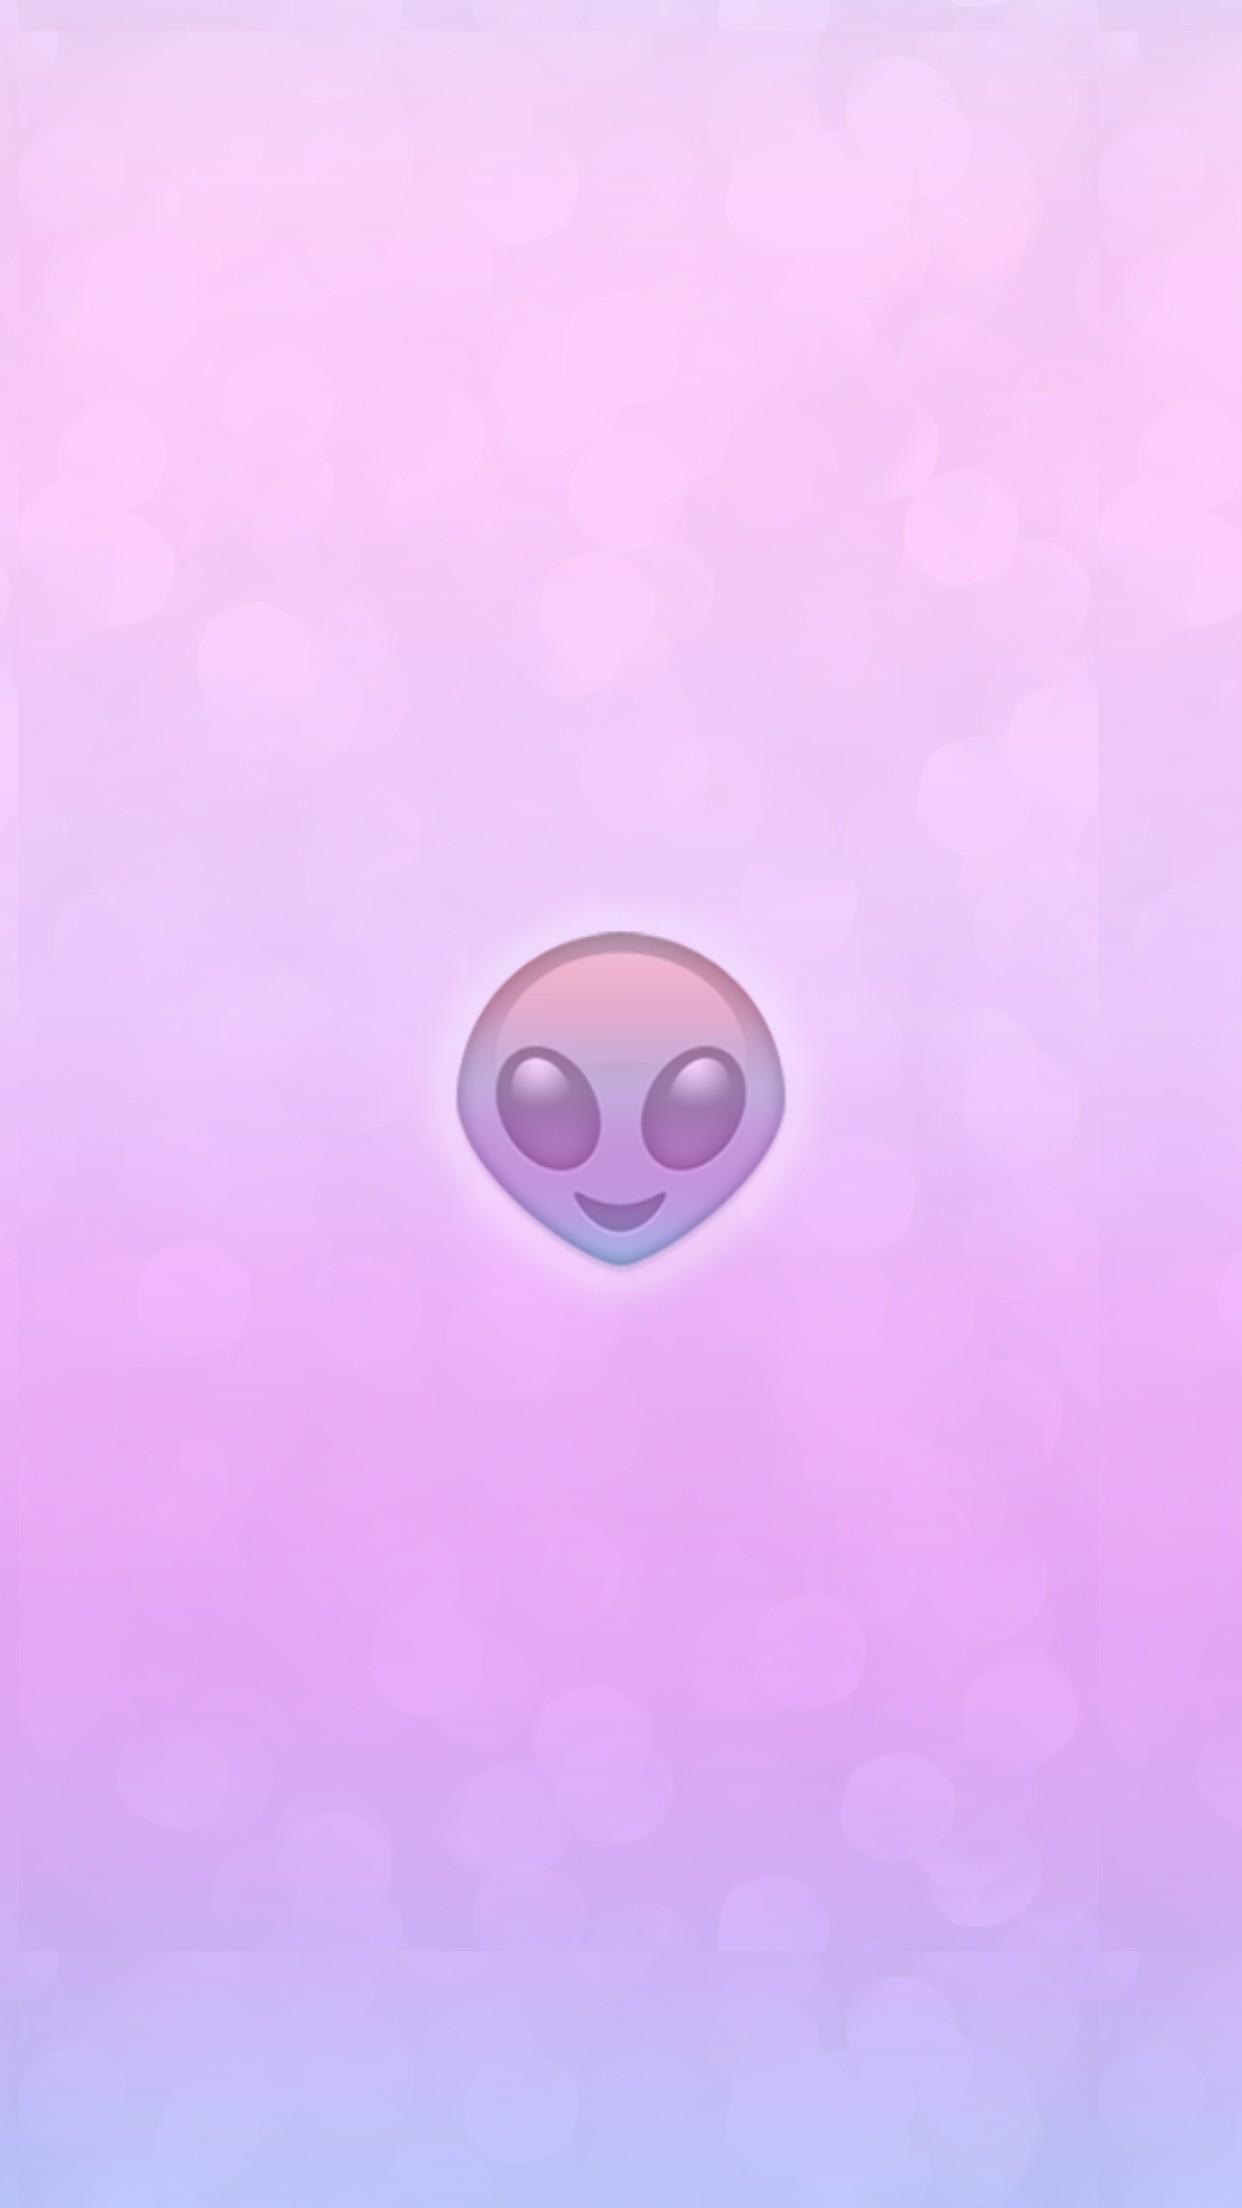 Alien Emoji Wallpaper 54 Images